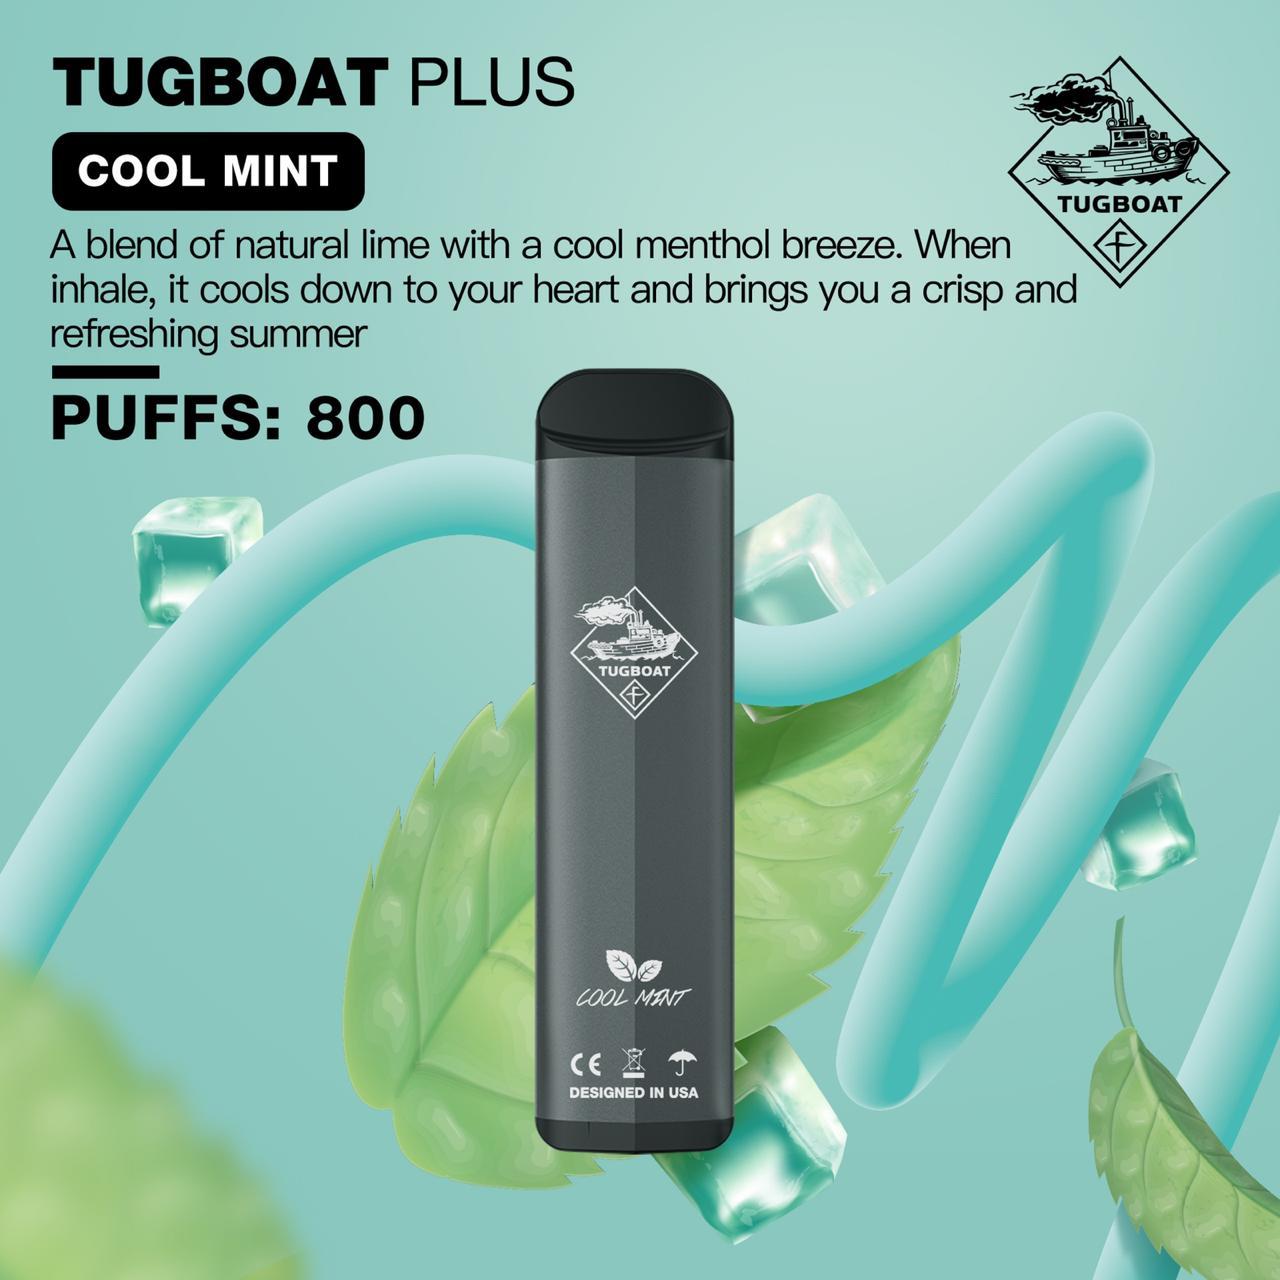 TUGBOAT PLUS COOL MINT IN DUBAI/UAE